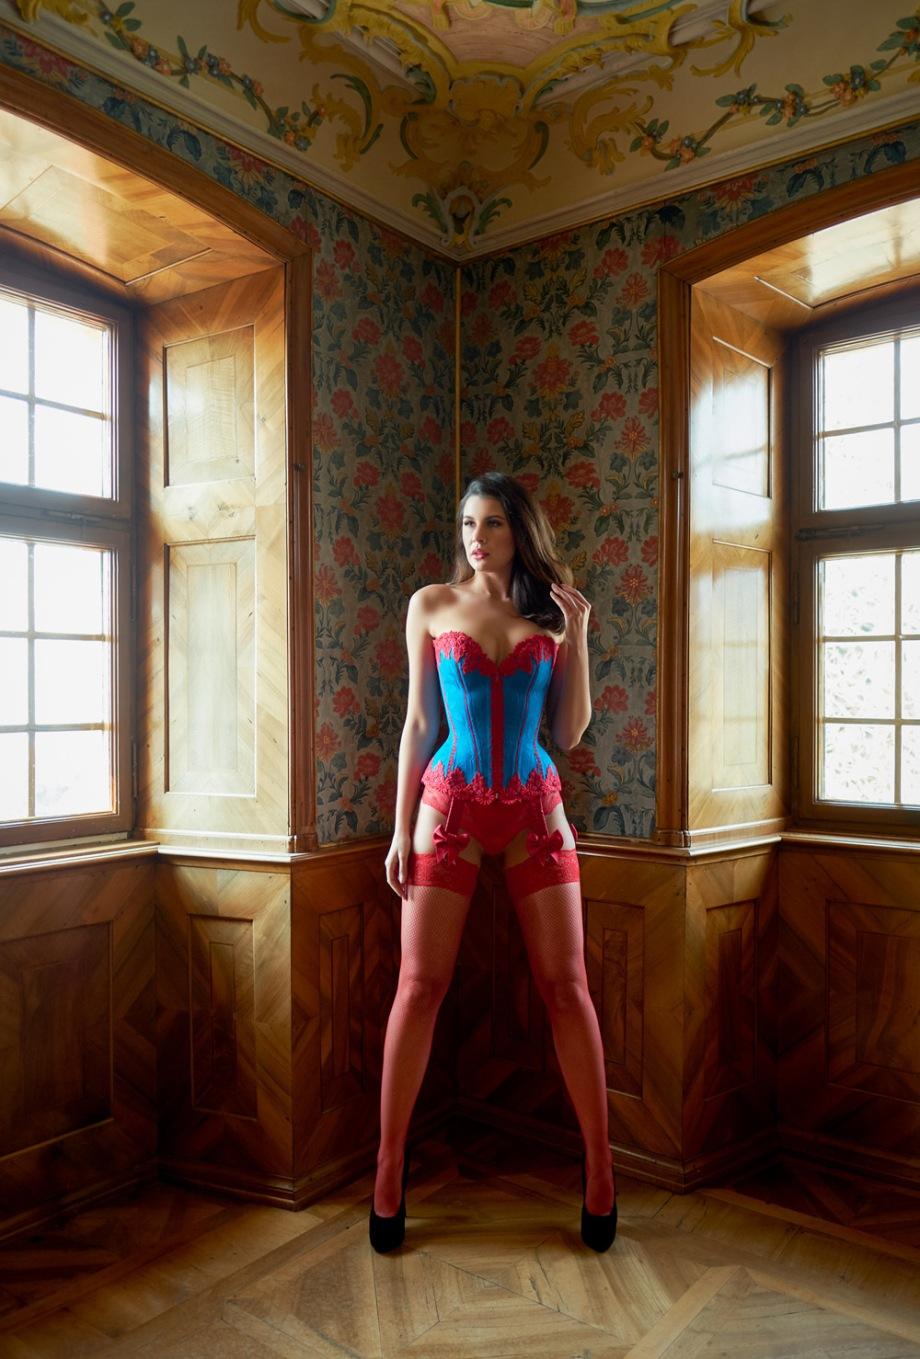 Boudoir Korsett by Beata Sievi Corset Artist, Photography: Ewald Vorberg, Model: Olga Kaminska